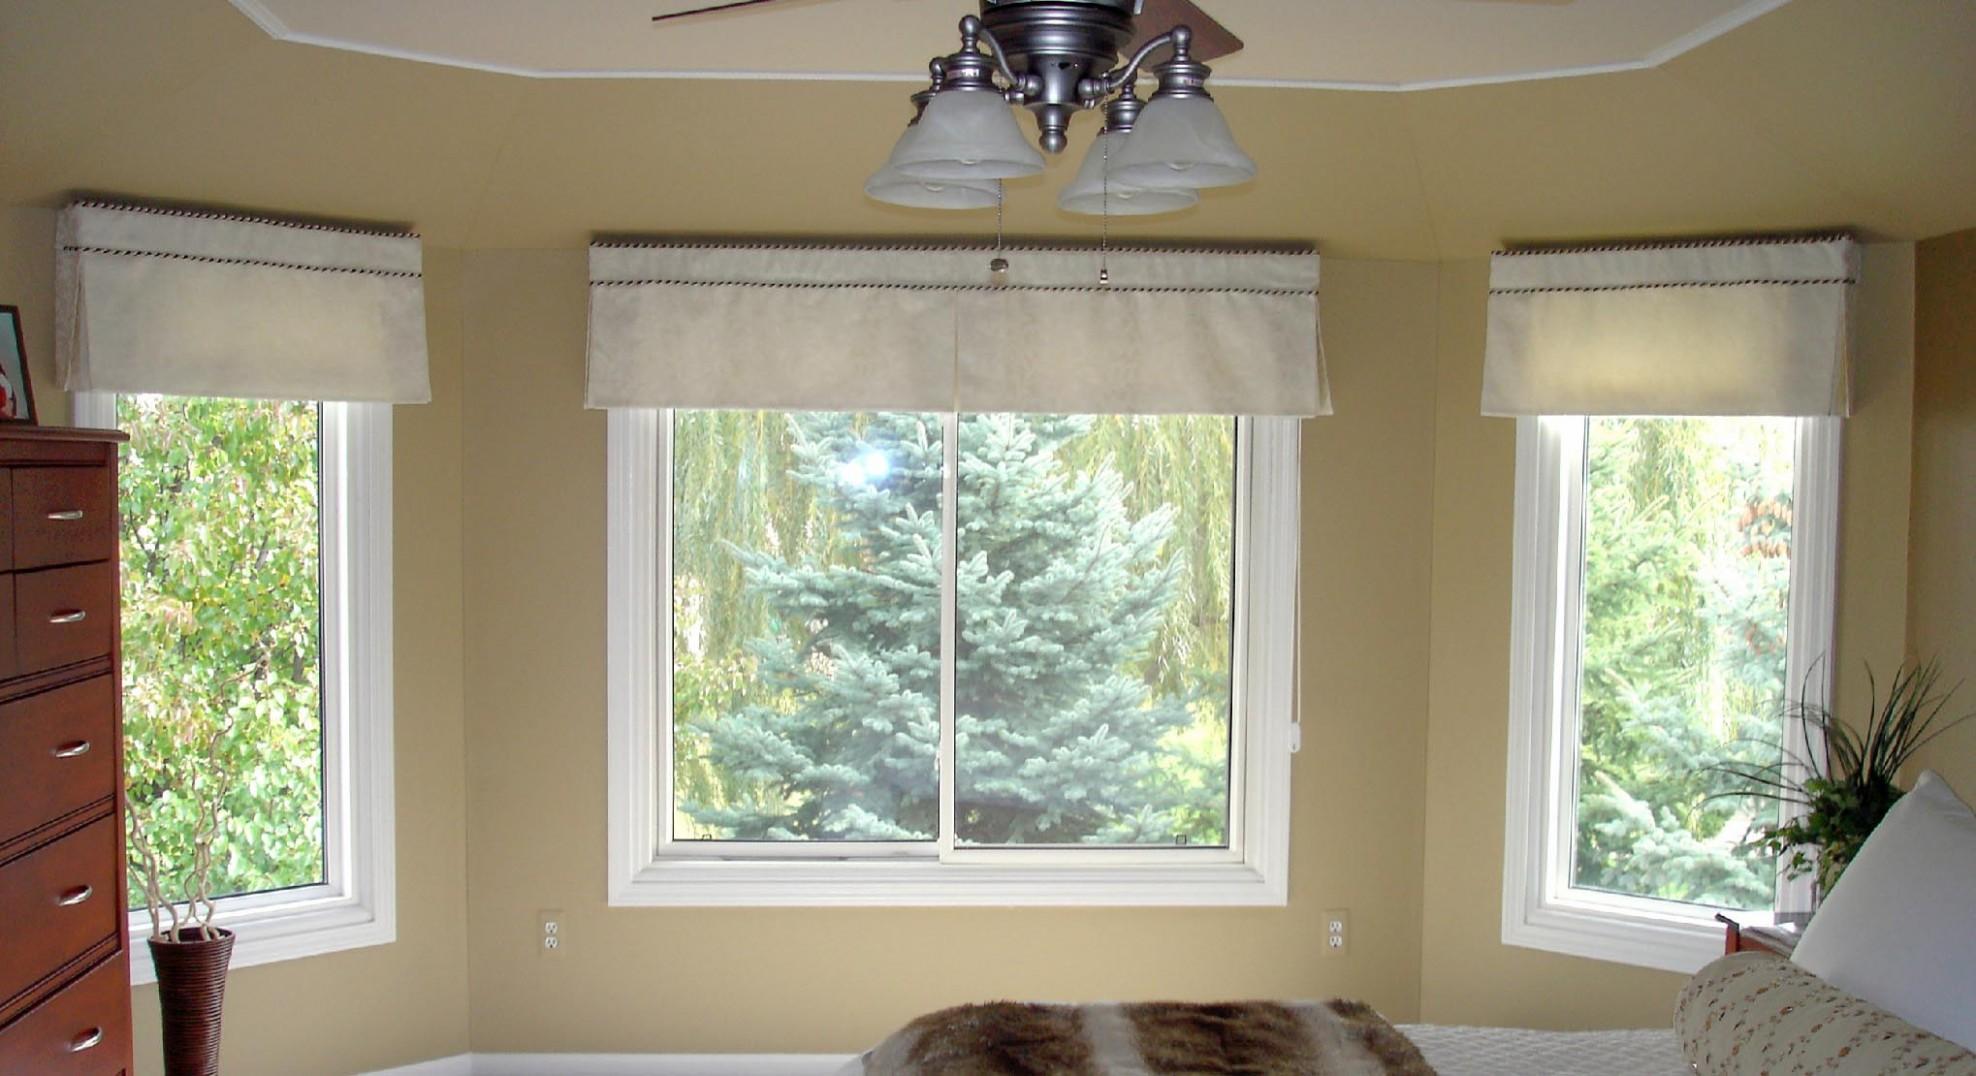 Bedroom Valances For Windows  Window Treatments Design Ideas - Window Valance Ideas For Bedroom